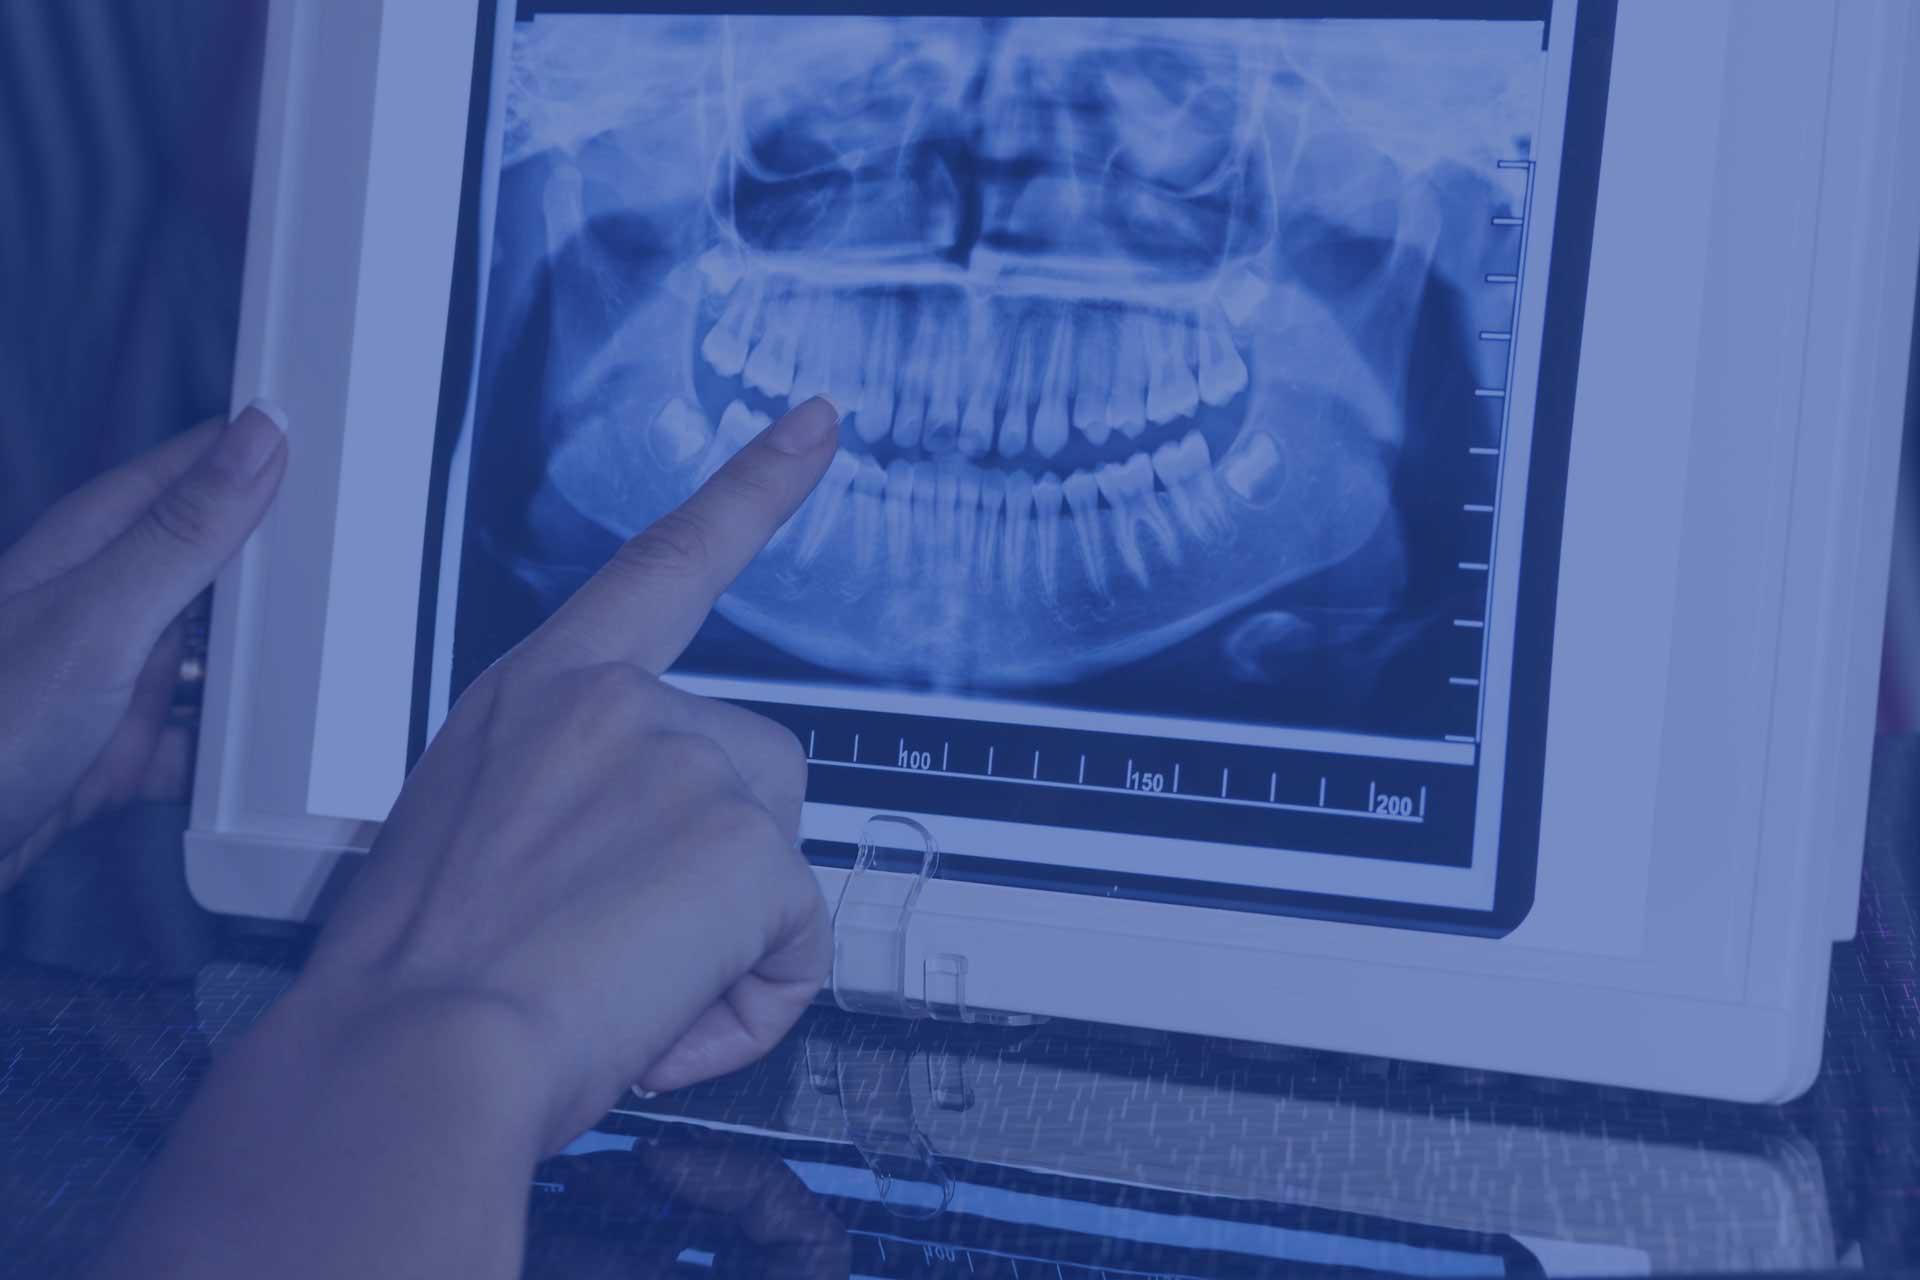 rx dental refertazione odontoiatrica online